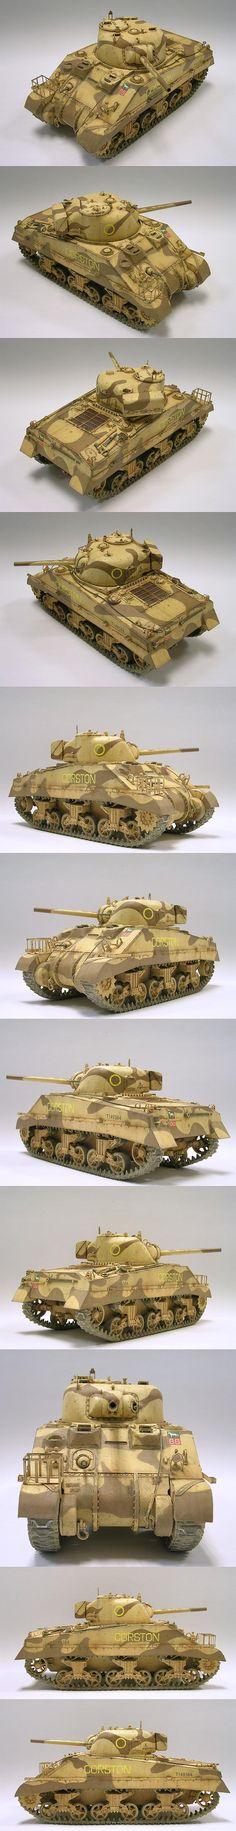 Plastic Model Kits, Plastic Models, Sherman Tank, Model Hobbies, Model Tanks, Armored Fighting Vehicle, Military Modelling, Ww2 Tanks, Military Diorama